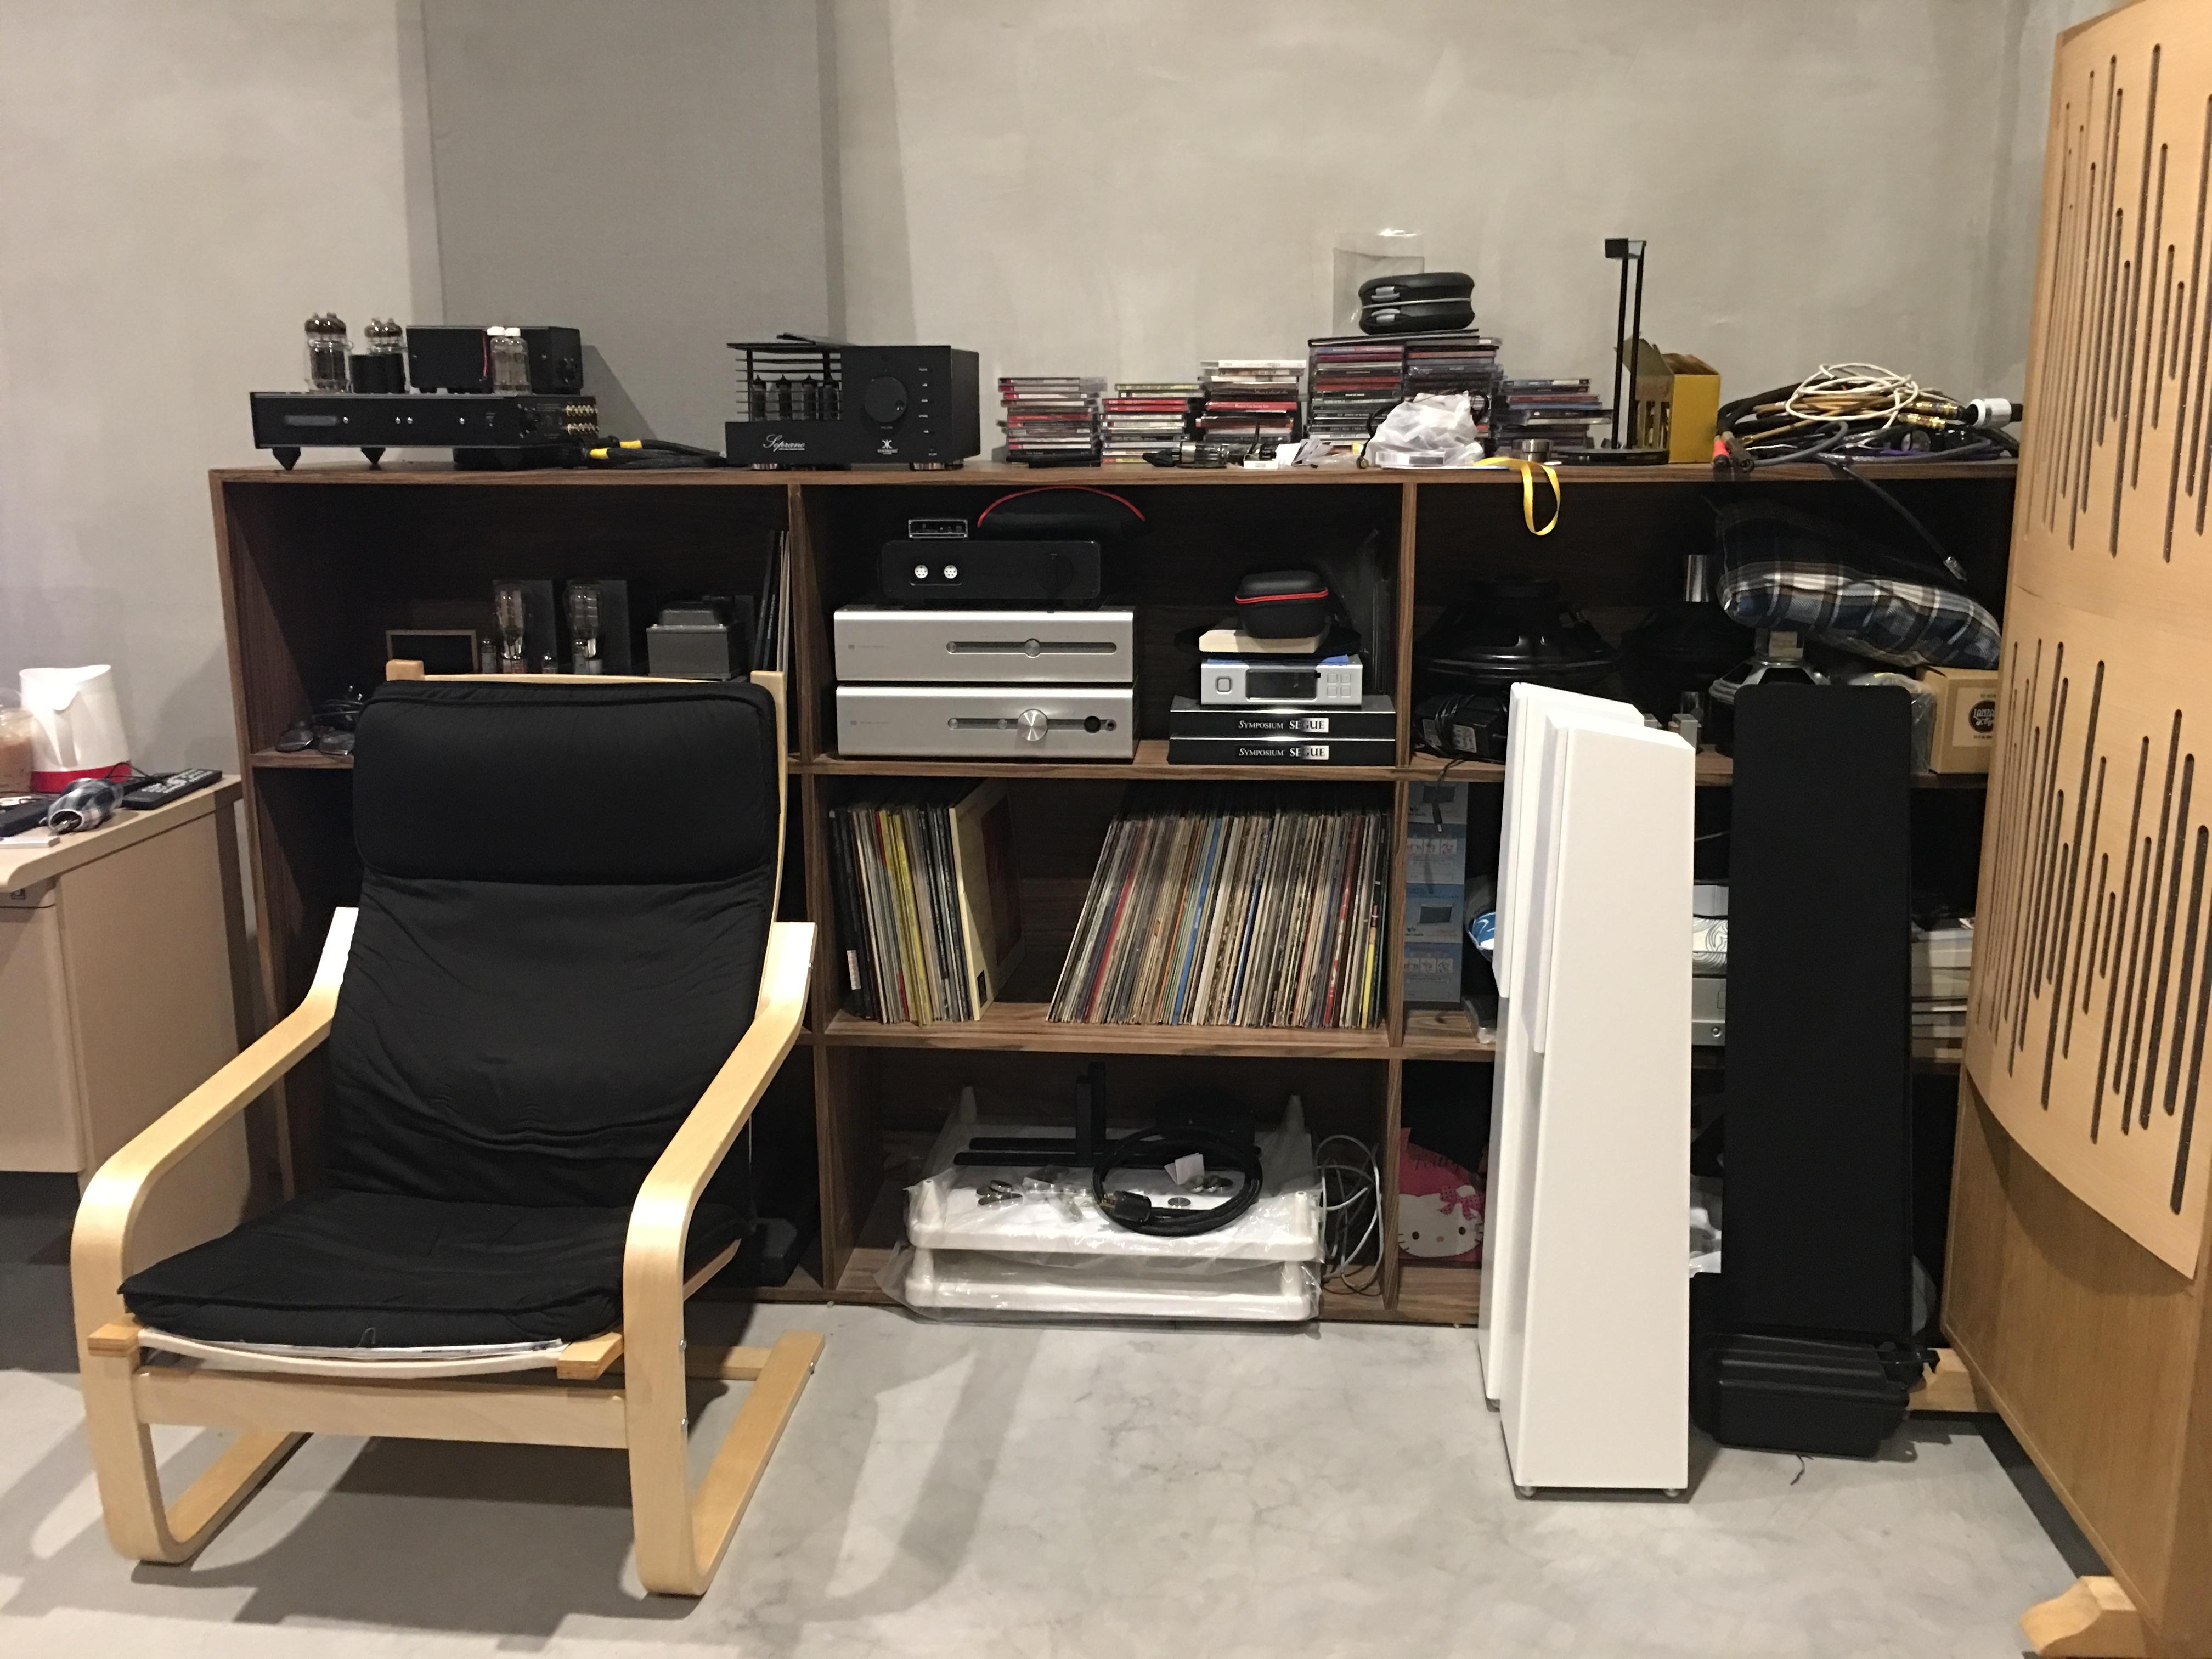 tinhte_zu_druid_v_speaker_room_set_up (4).JPG